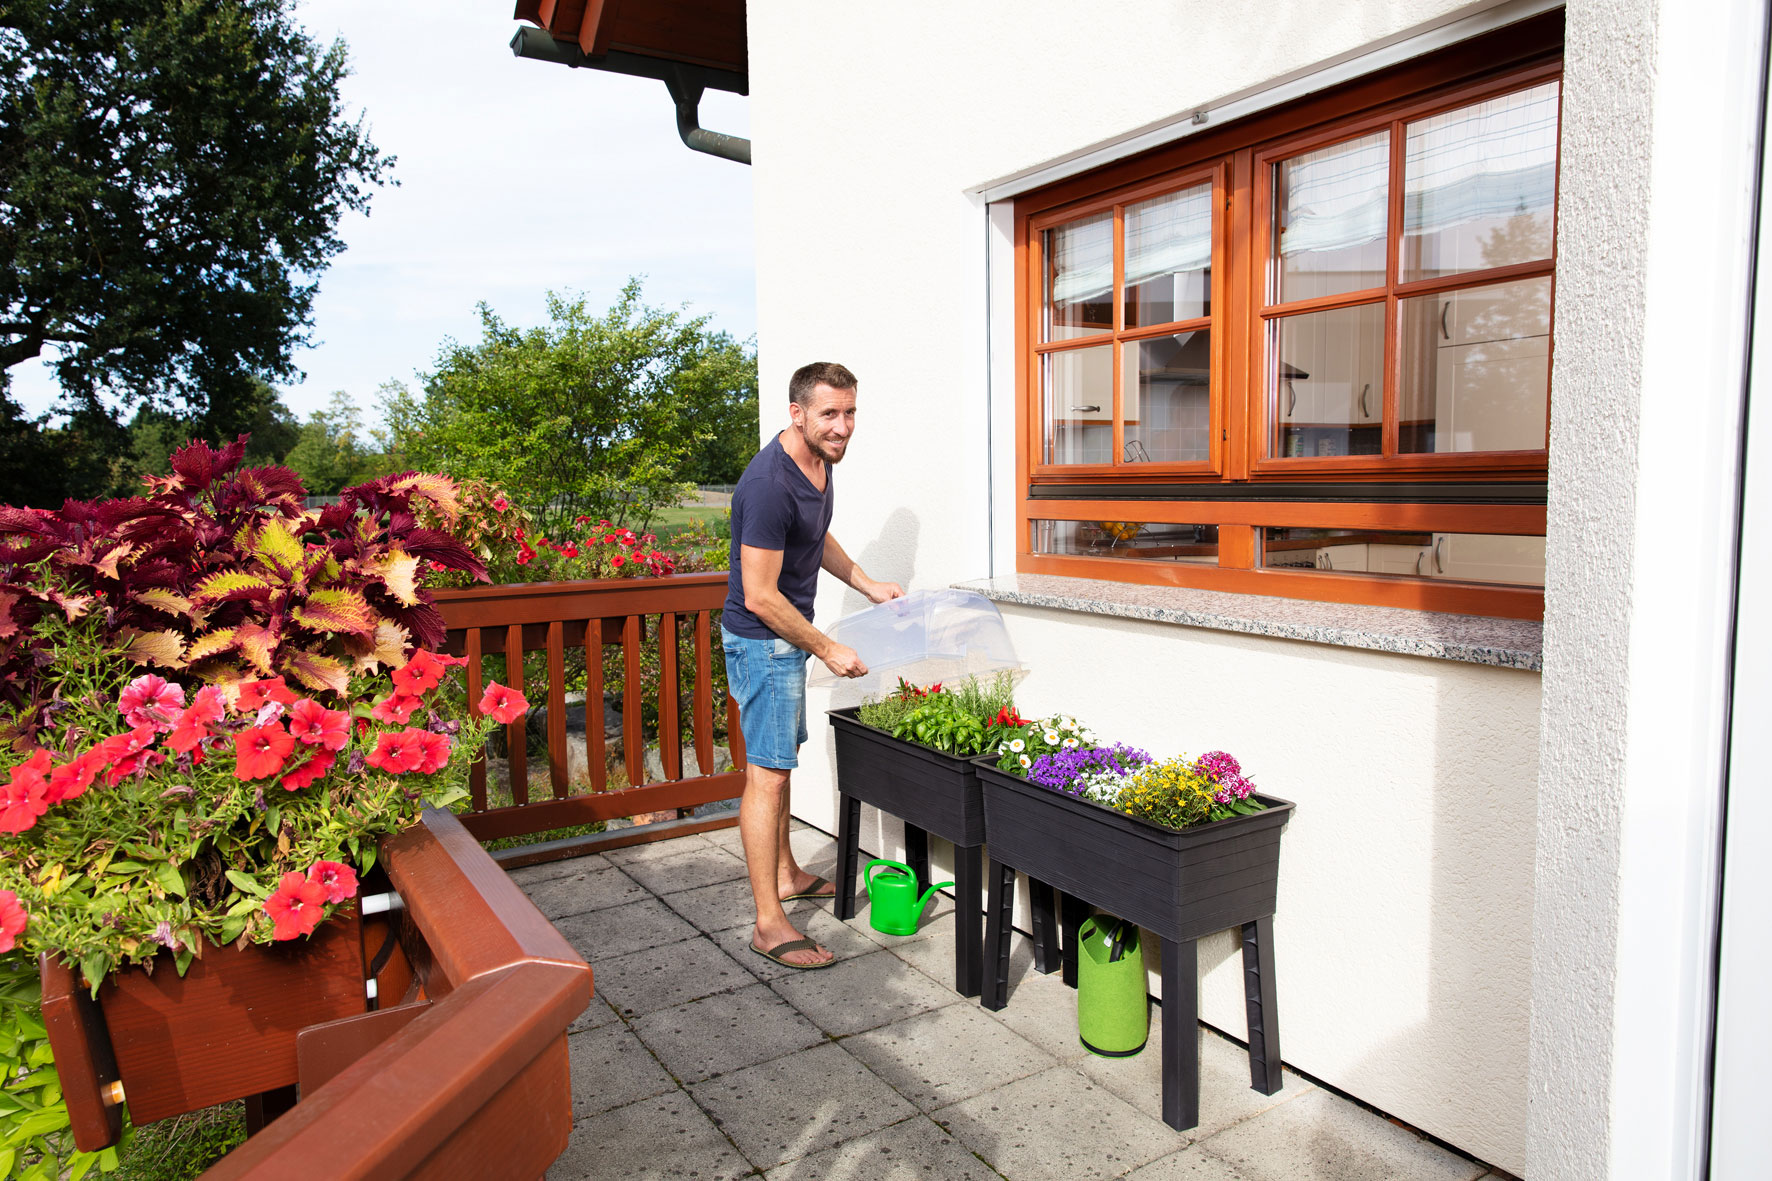 Hochbeet GARANTIA Balkon-Hochbeet Urban 75x37x65cm Bild 6